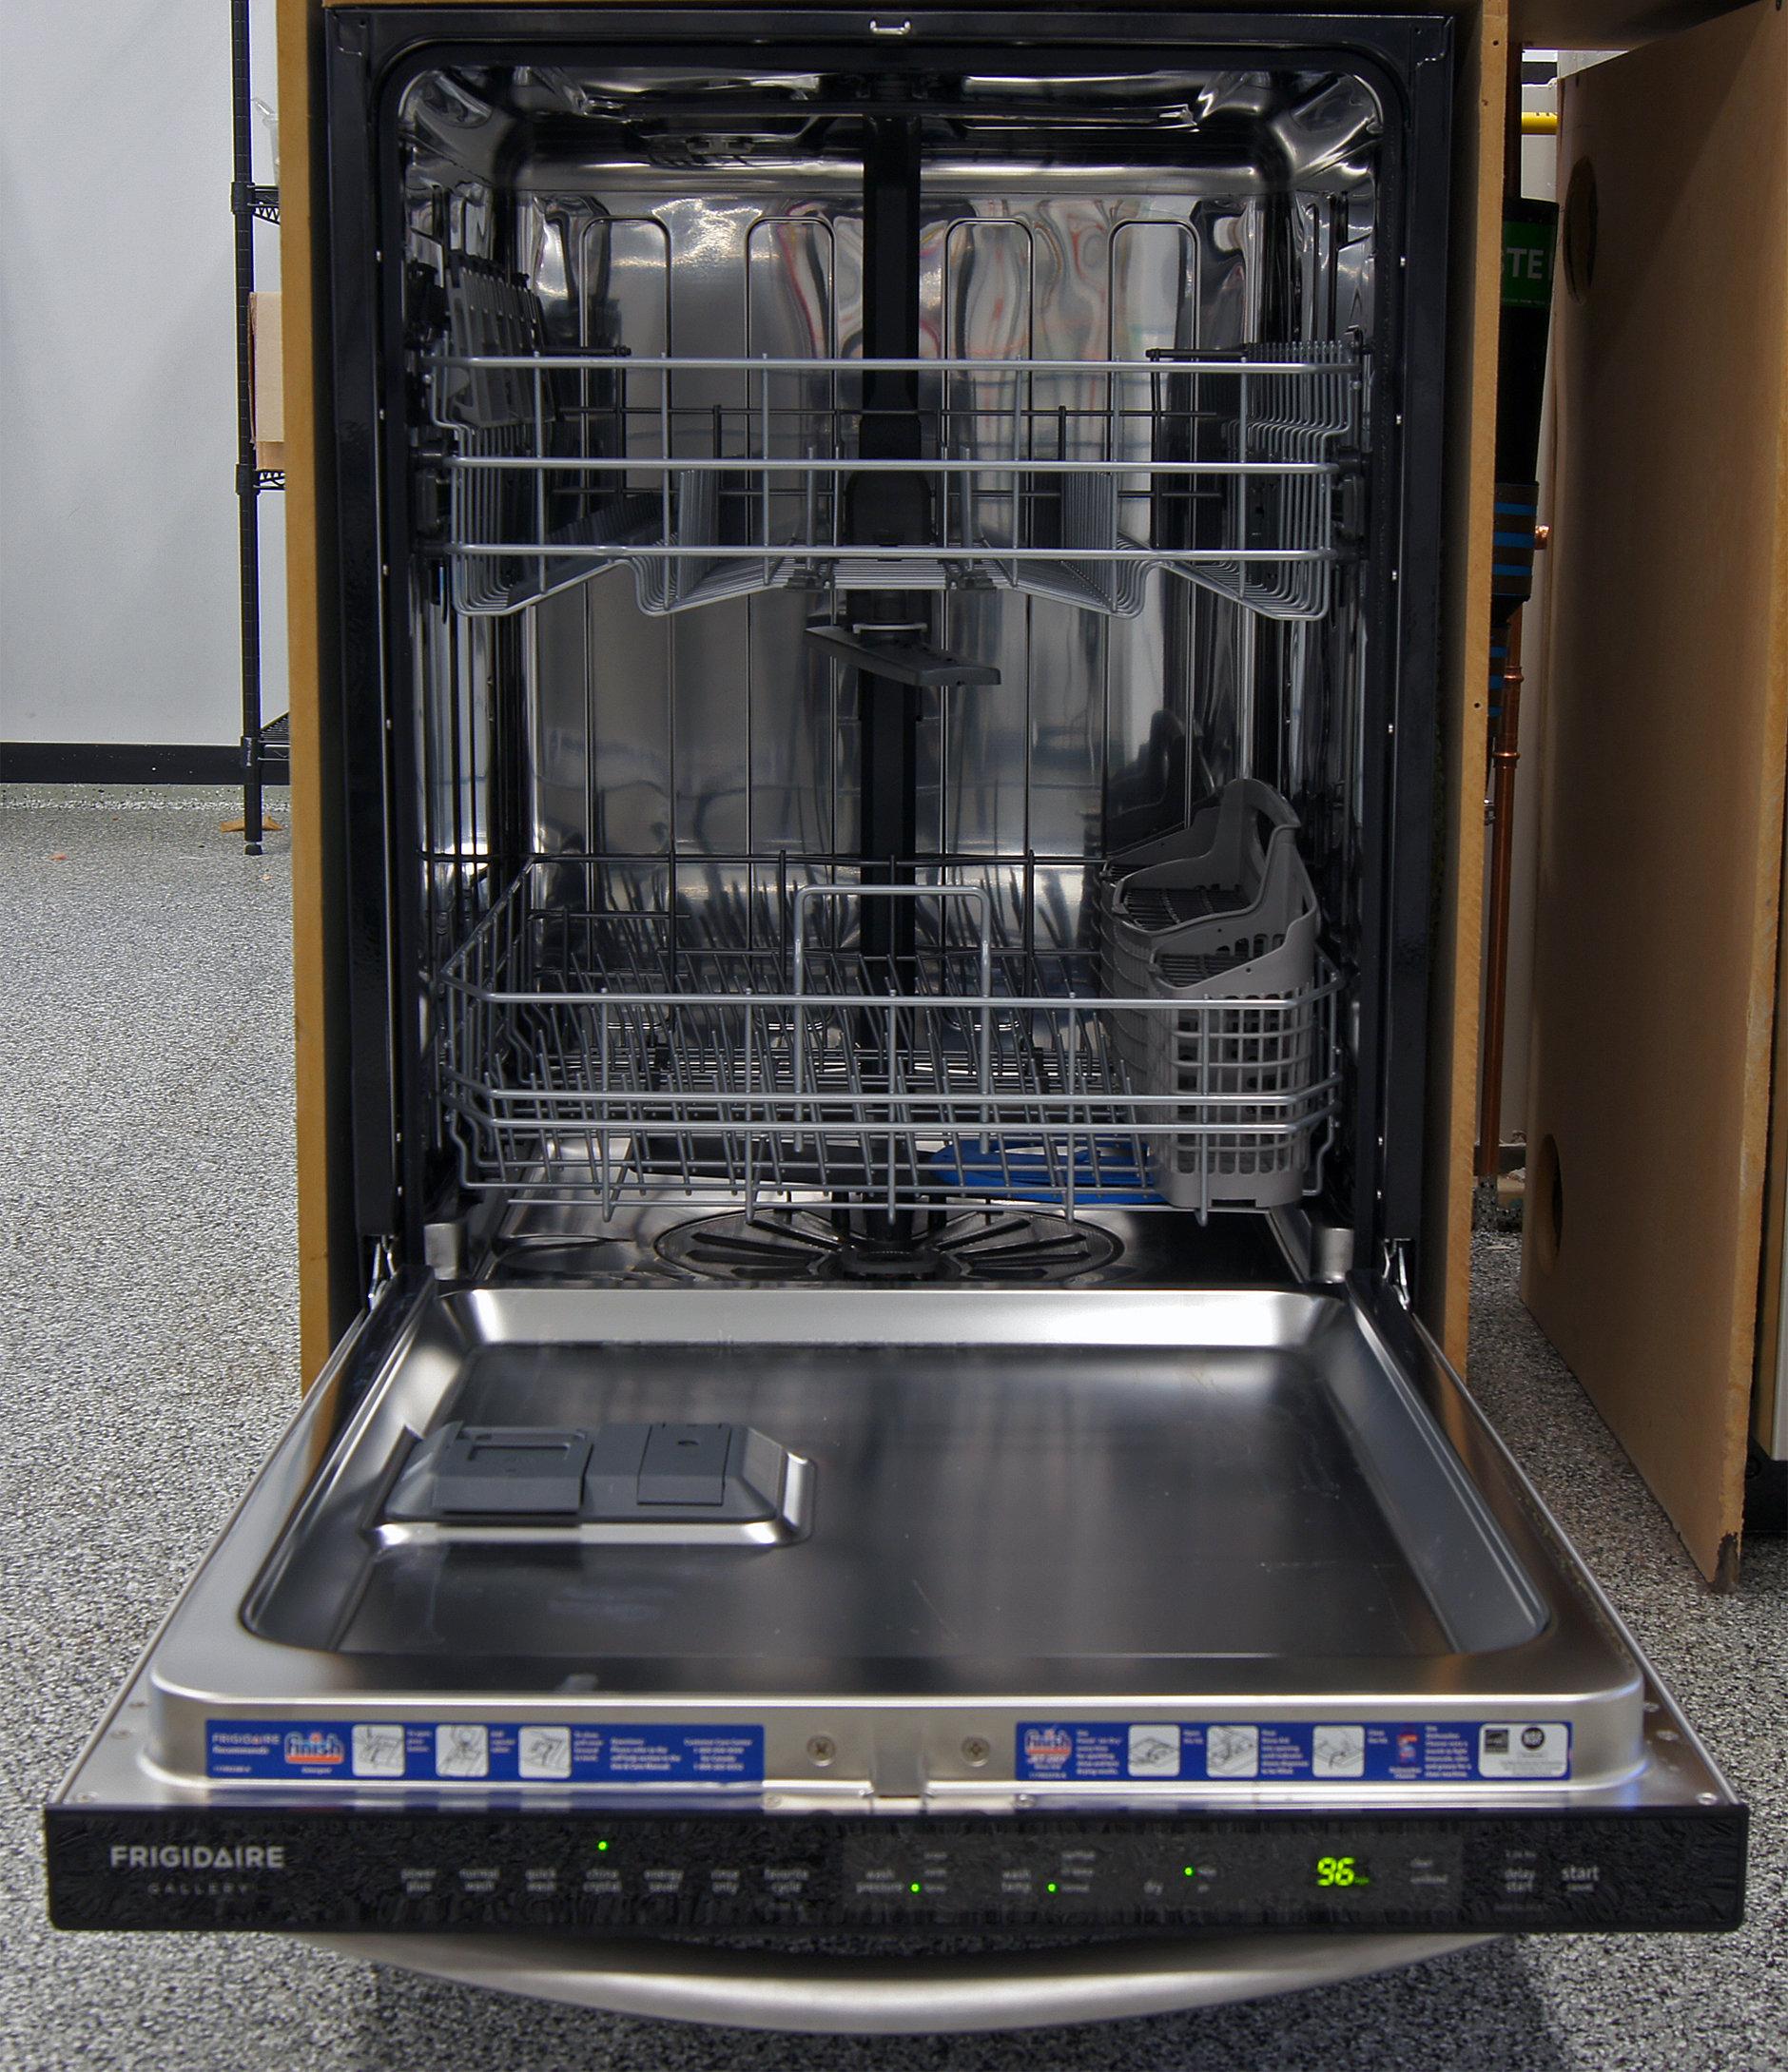 Frigidaire Gallery FGID2474QF Dishwasher Review